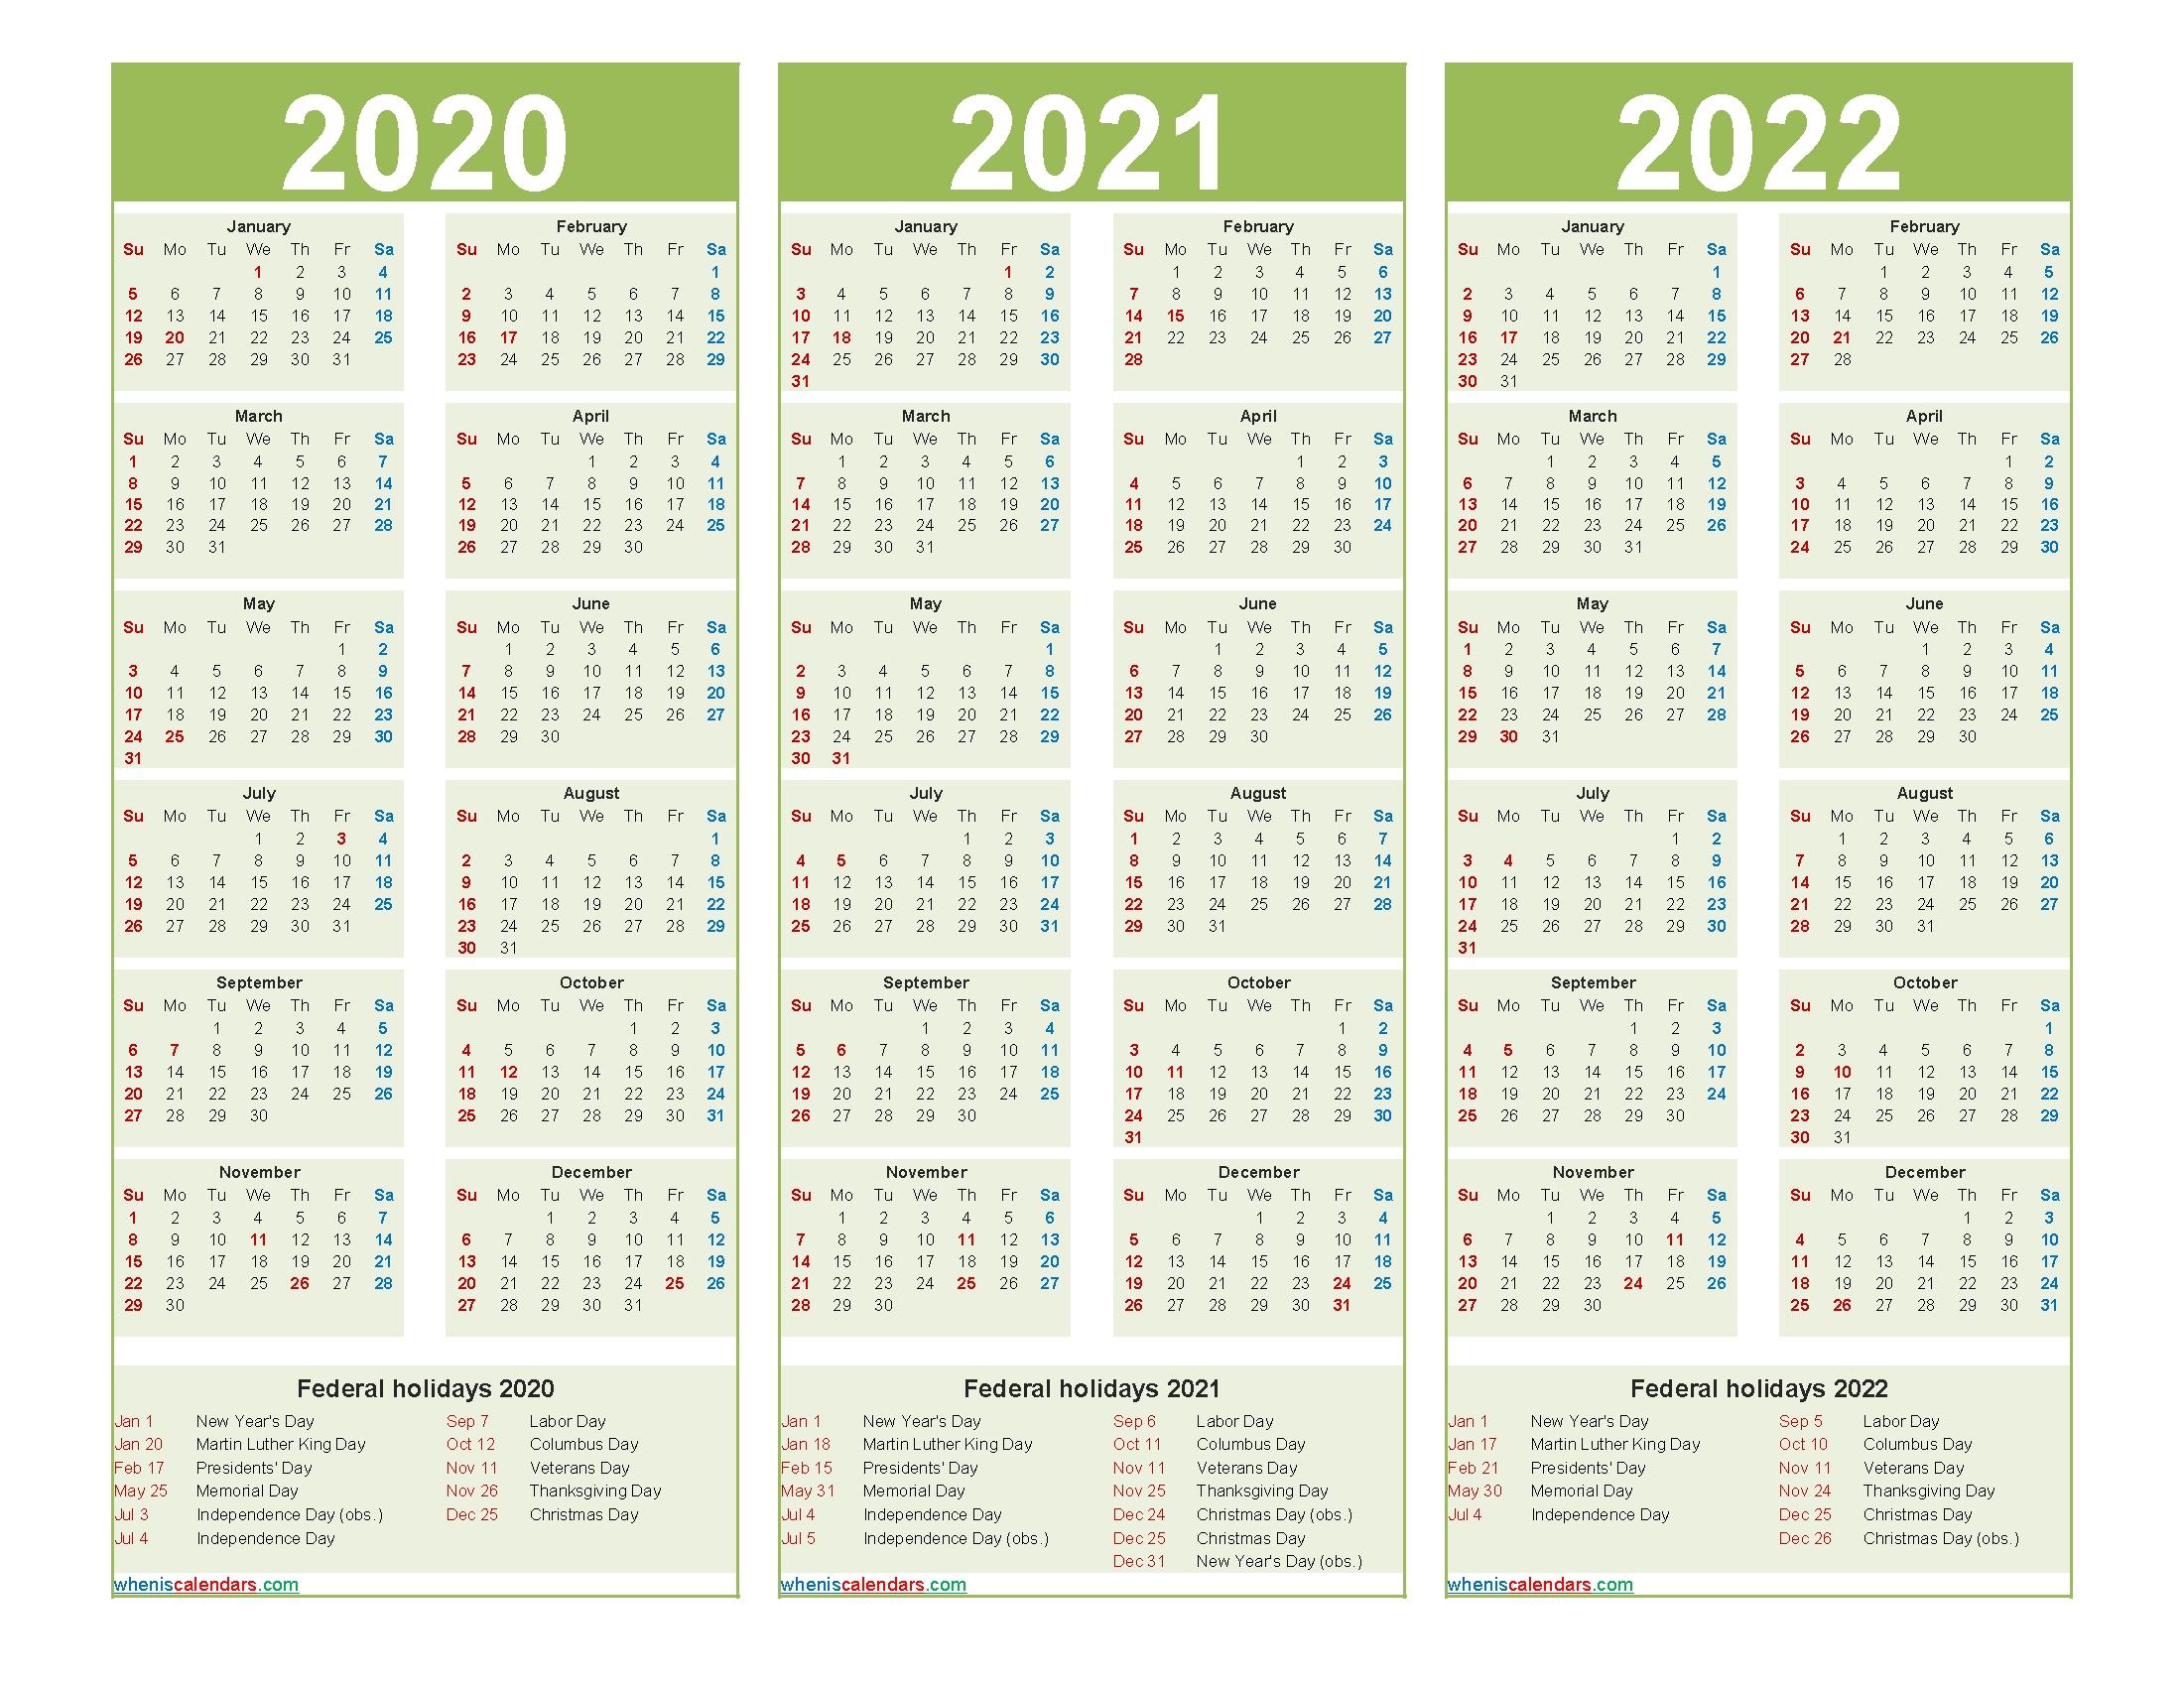 Three Year 2020 To 2022 Calendar Printable Word, Pdf for 3 Year Calendar 2021 2021 2022 Graphics